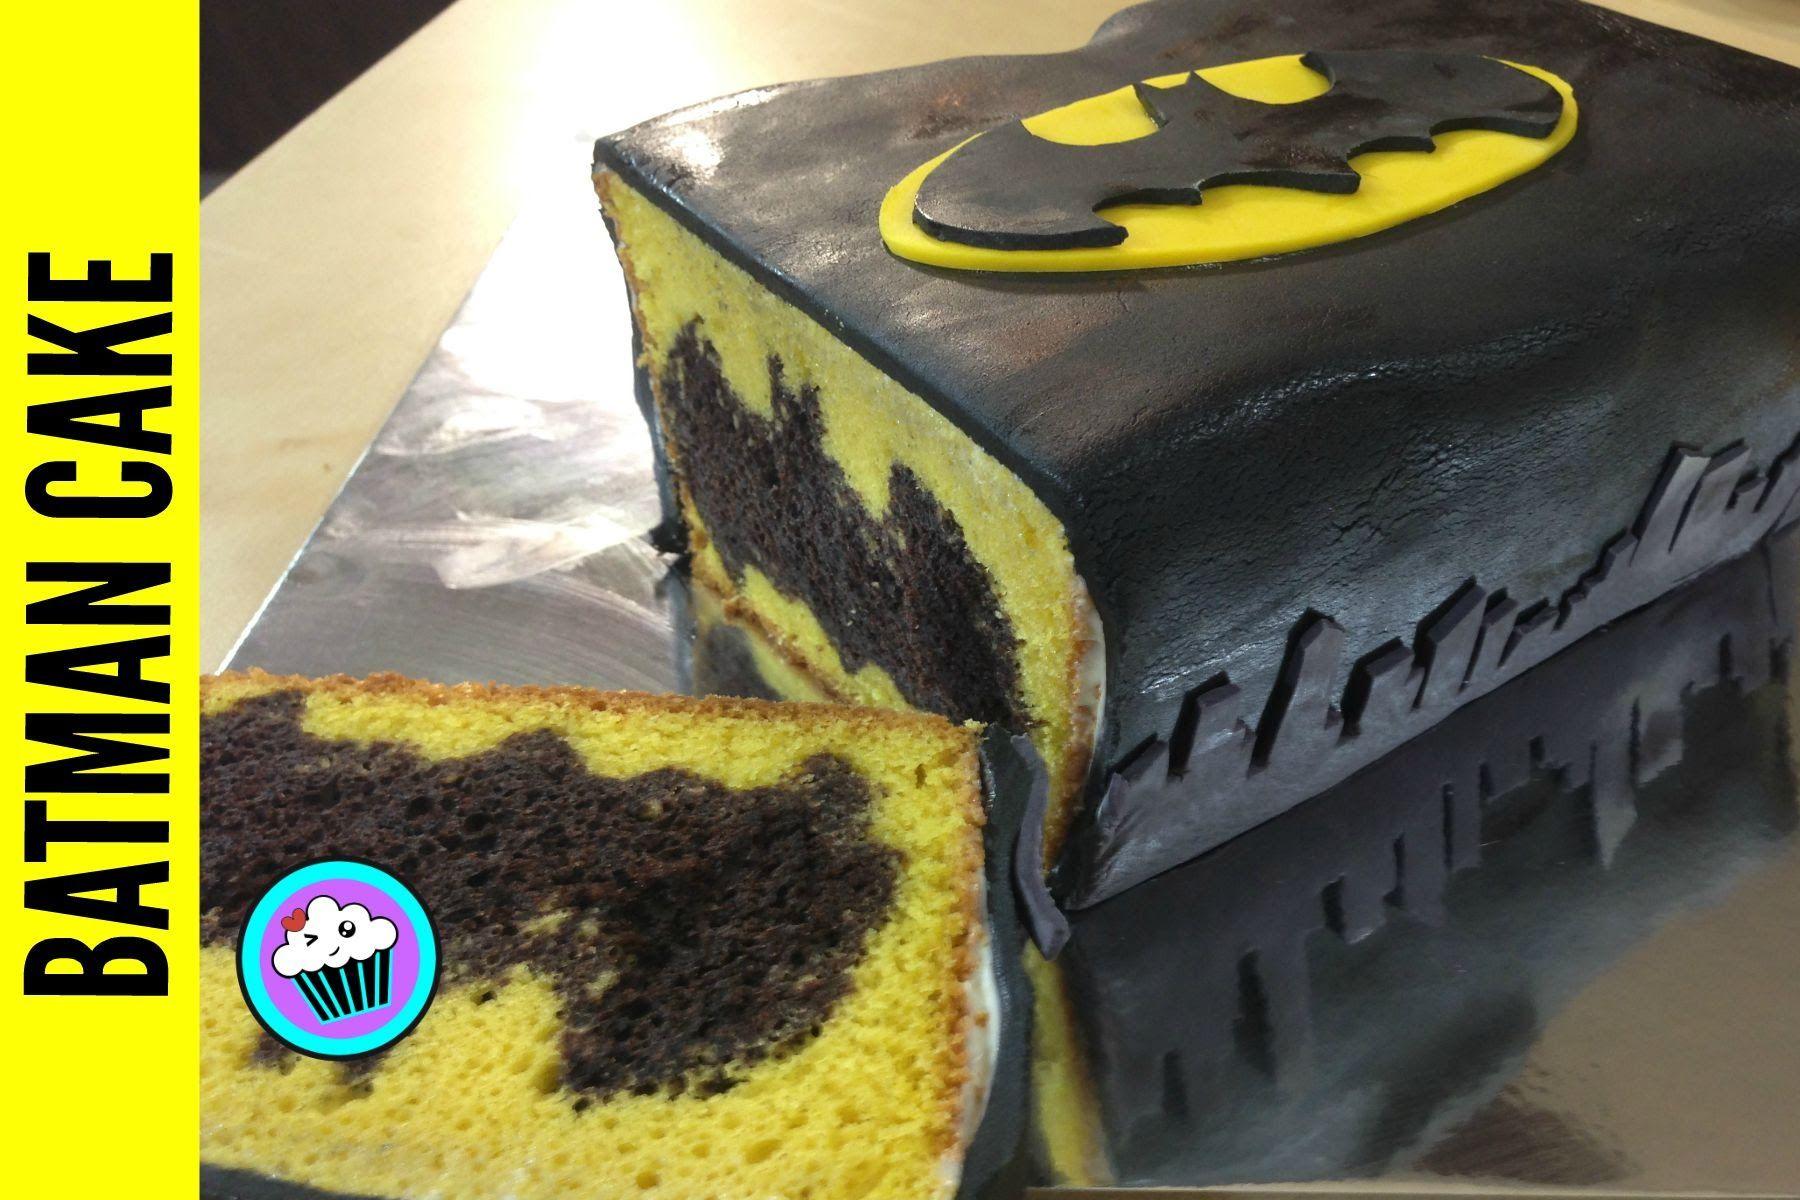 Today I Made Batman Surprise Inside Cake I Had To Make A Special